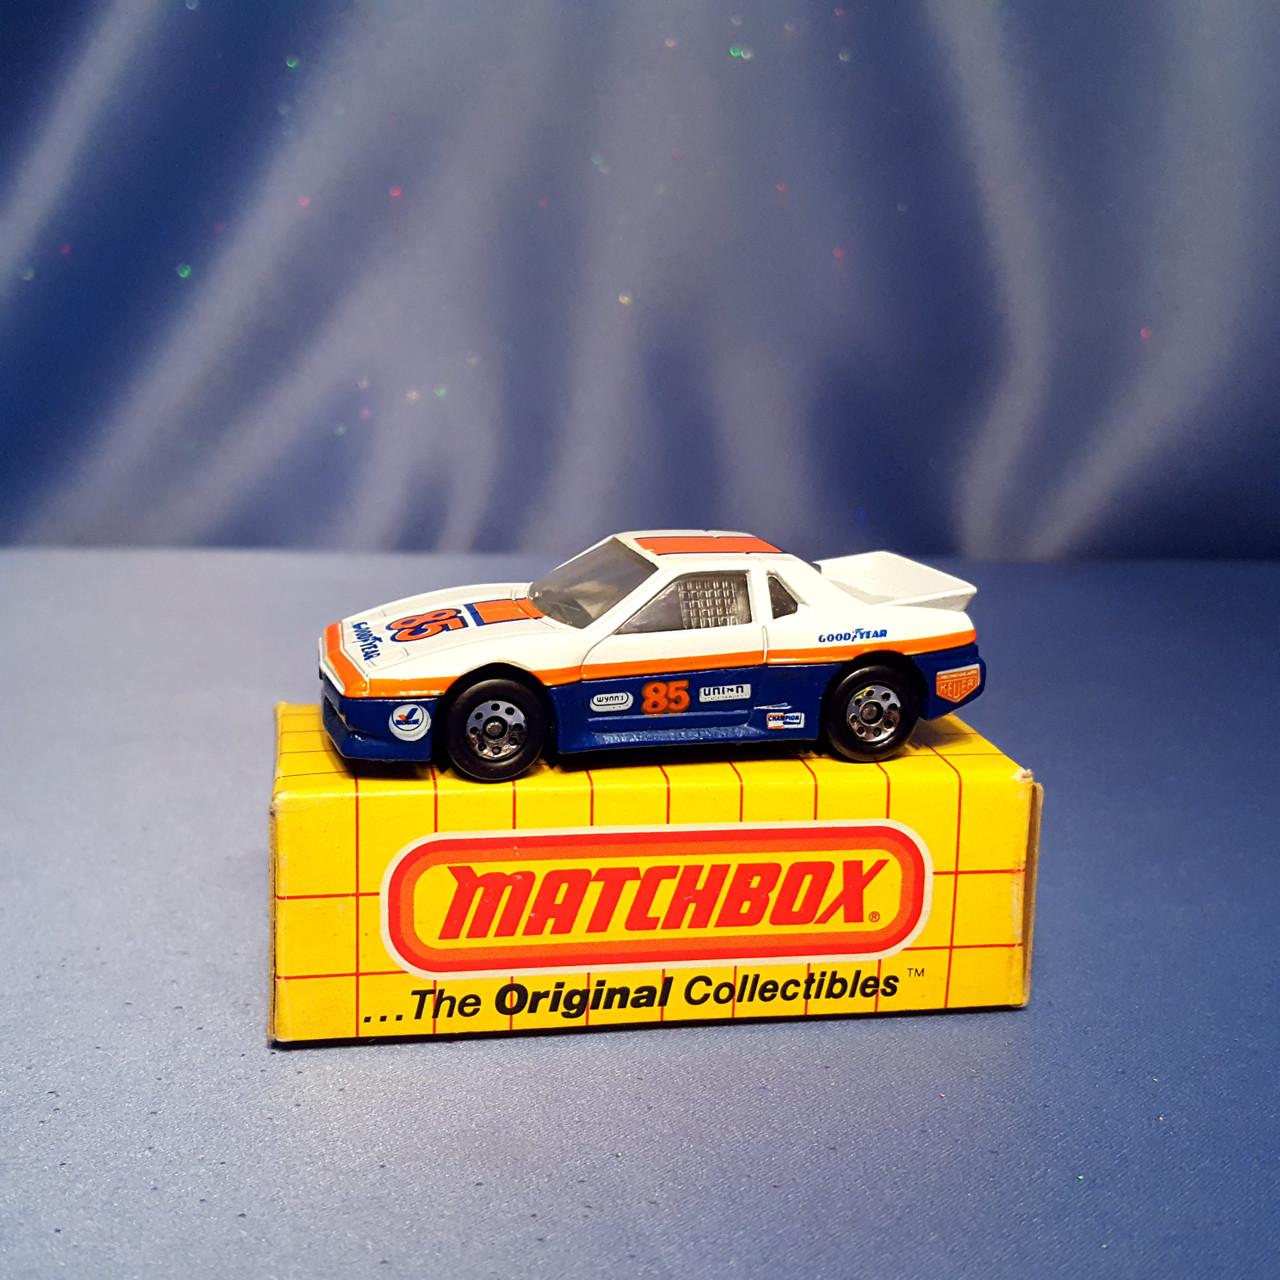 1985 Pontiac Fiero Car By Matchbox Now And Then Galleria Llc